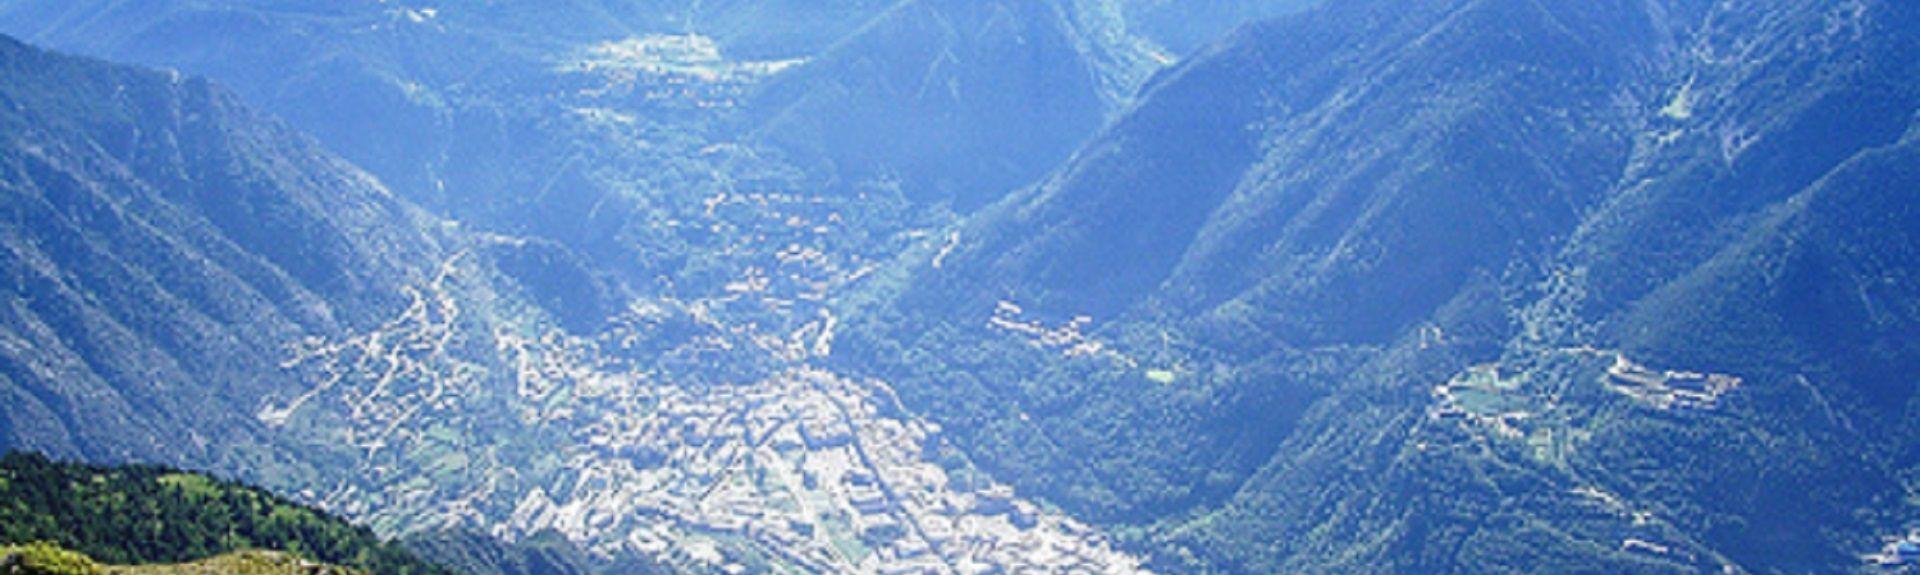 Naturlandia (parque turístico), Sant Julià de Lòria, Andorra